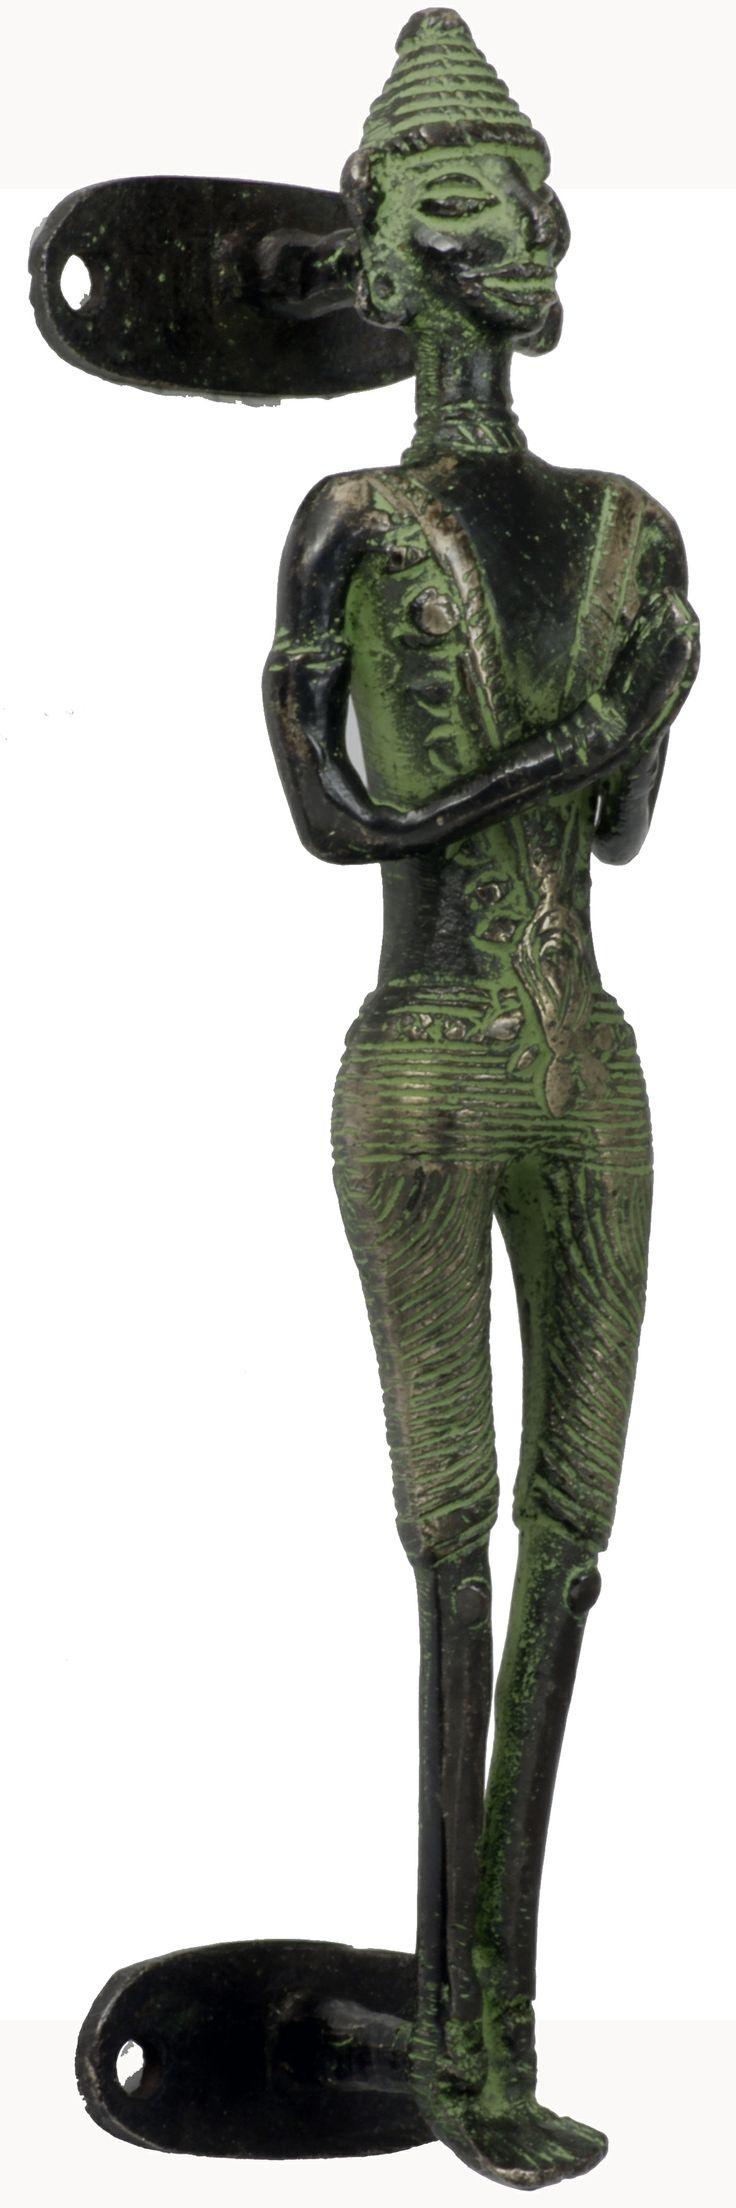 Temple Figurine- Indian Pulls & Knobs #motherofpearl #hardware #MOP #knobs #homdeco #renovation #indian #pulls